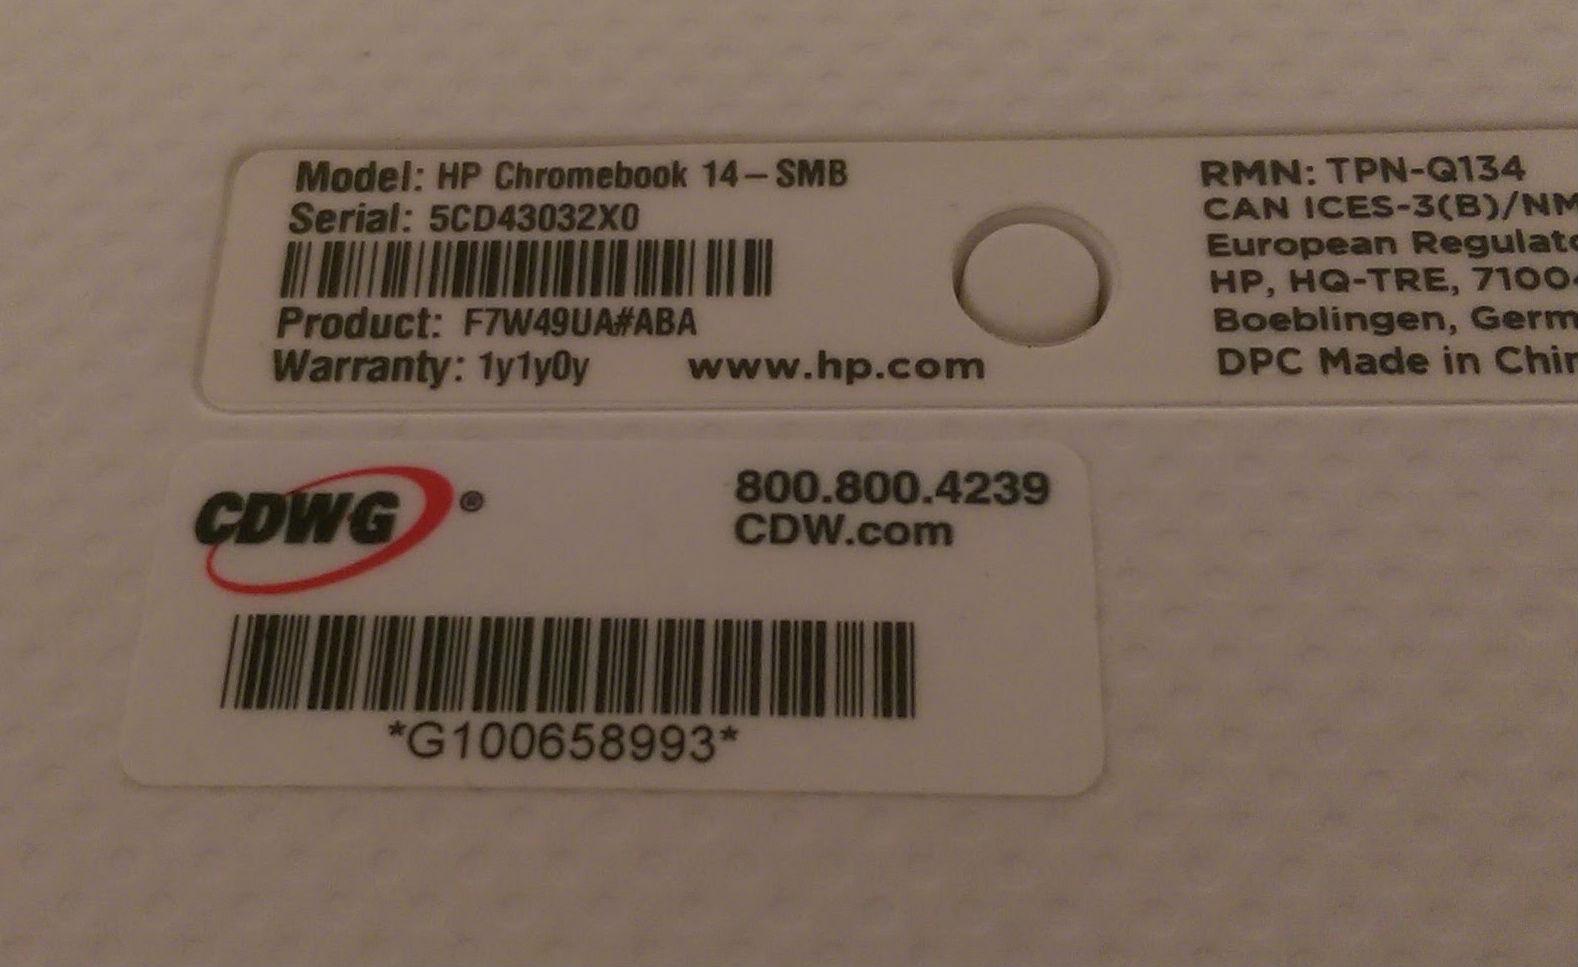 find serial number on hp chromebook